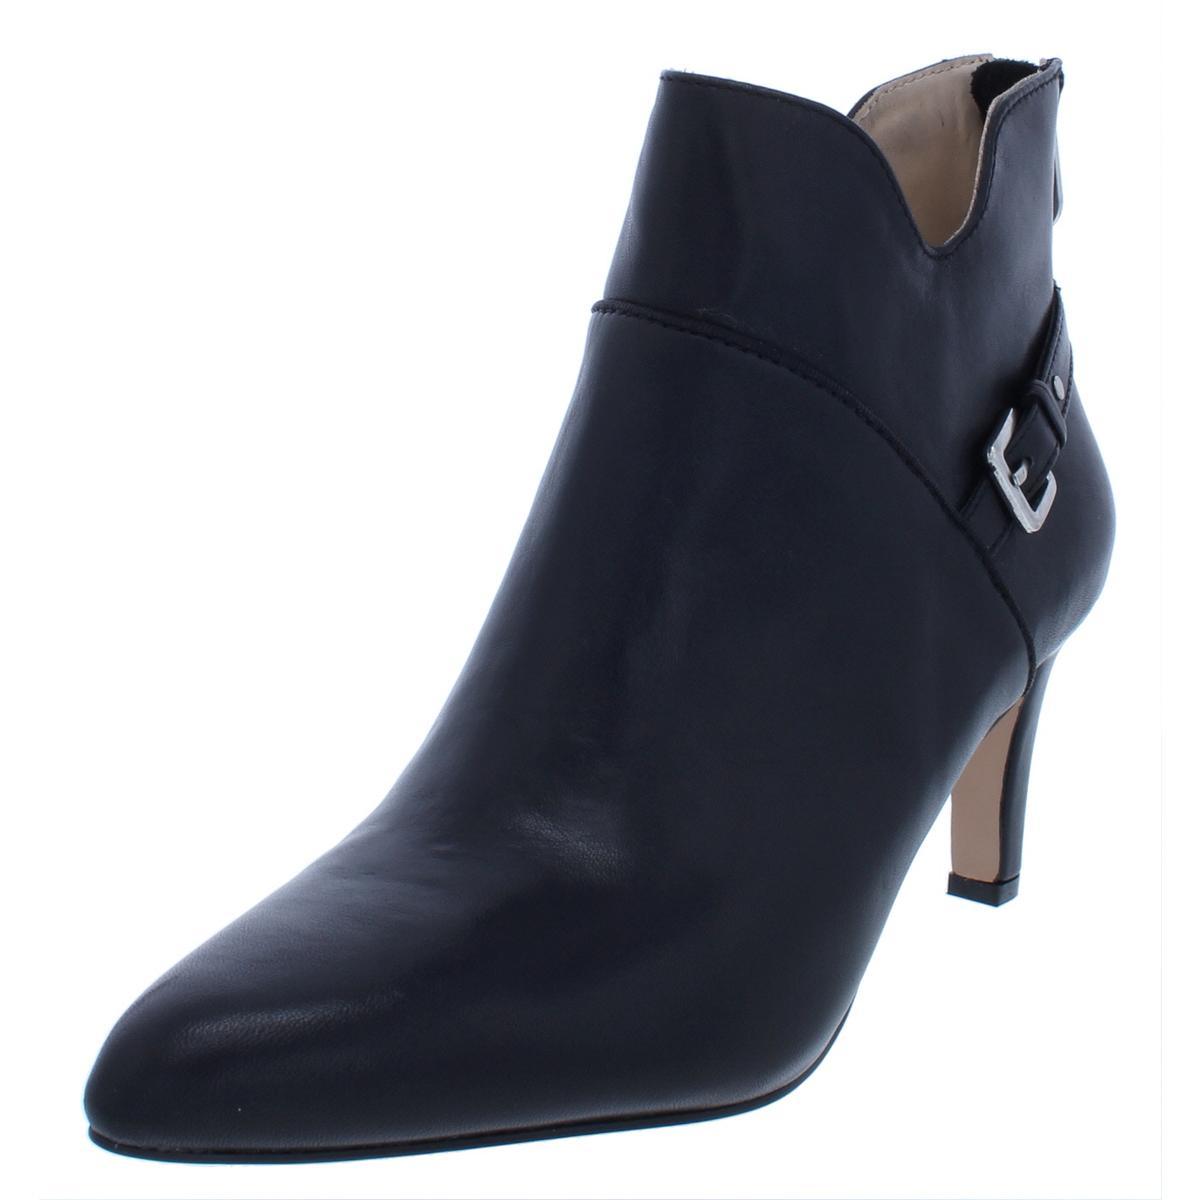 Adrienne Vittadini Damenschuhe Shaye Buckle Pointed Toe Heel BHFO Booties Schuhes BHFO Heel 7006 a6f456